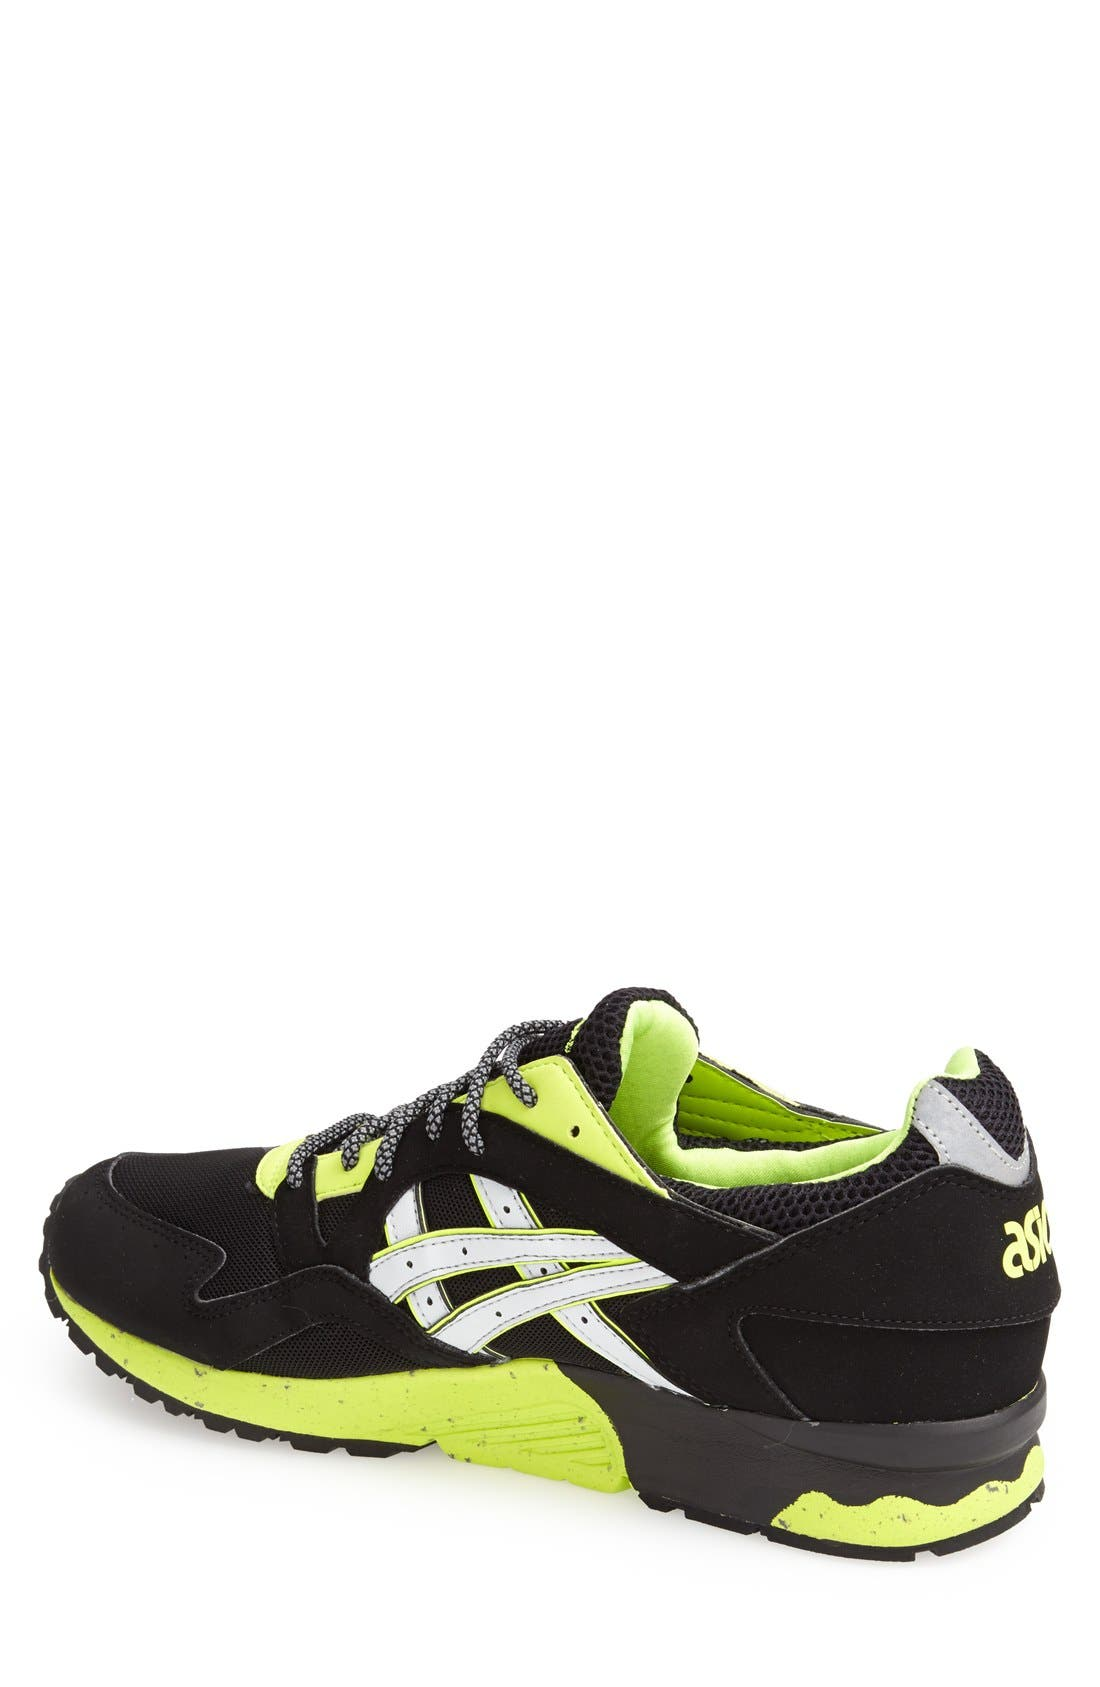 'GEL-Lyte V' Gore-Tex<sup>®</sup> Sneaker,                             Alternate thumbnail 2, color,                             004